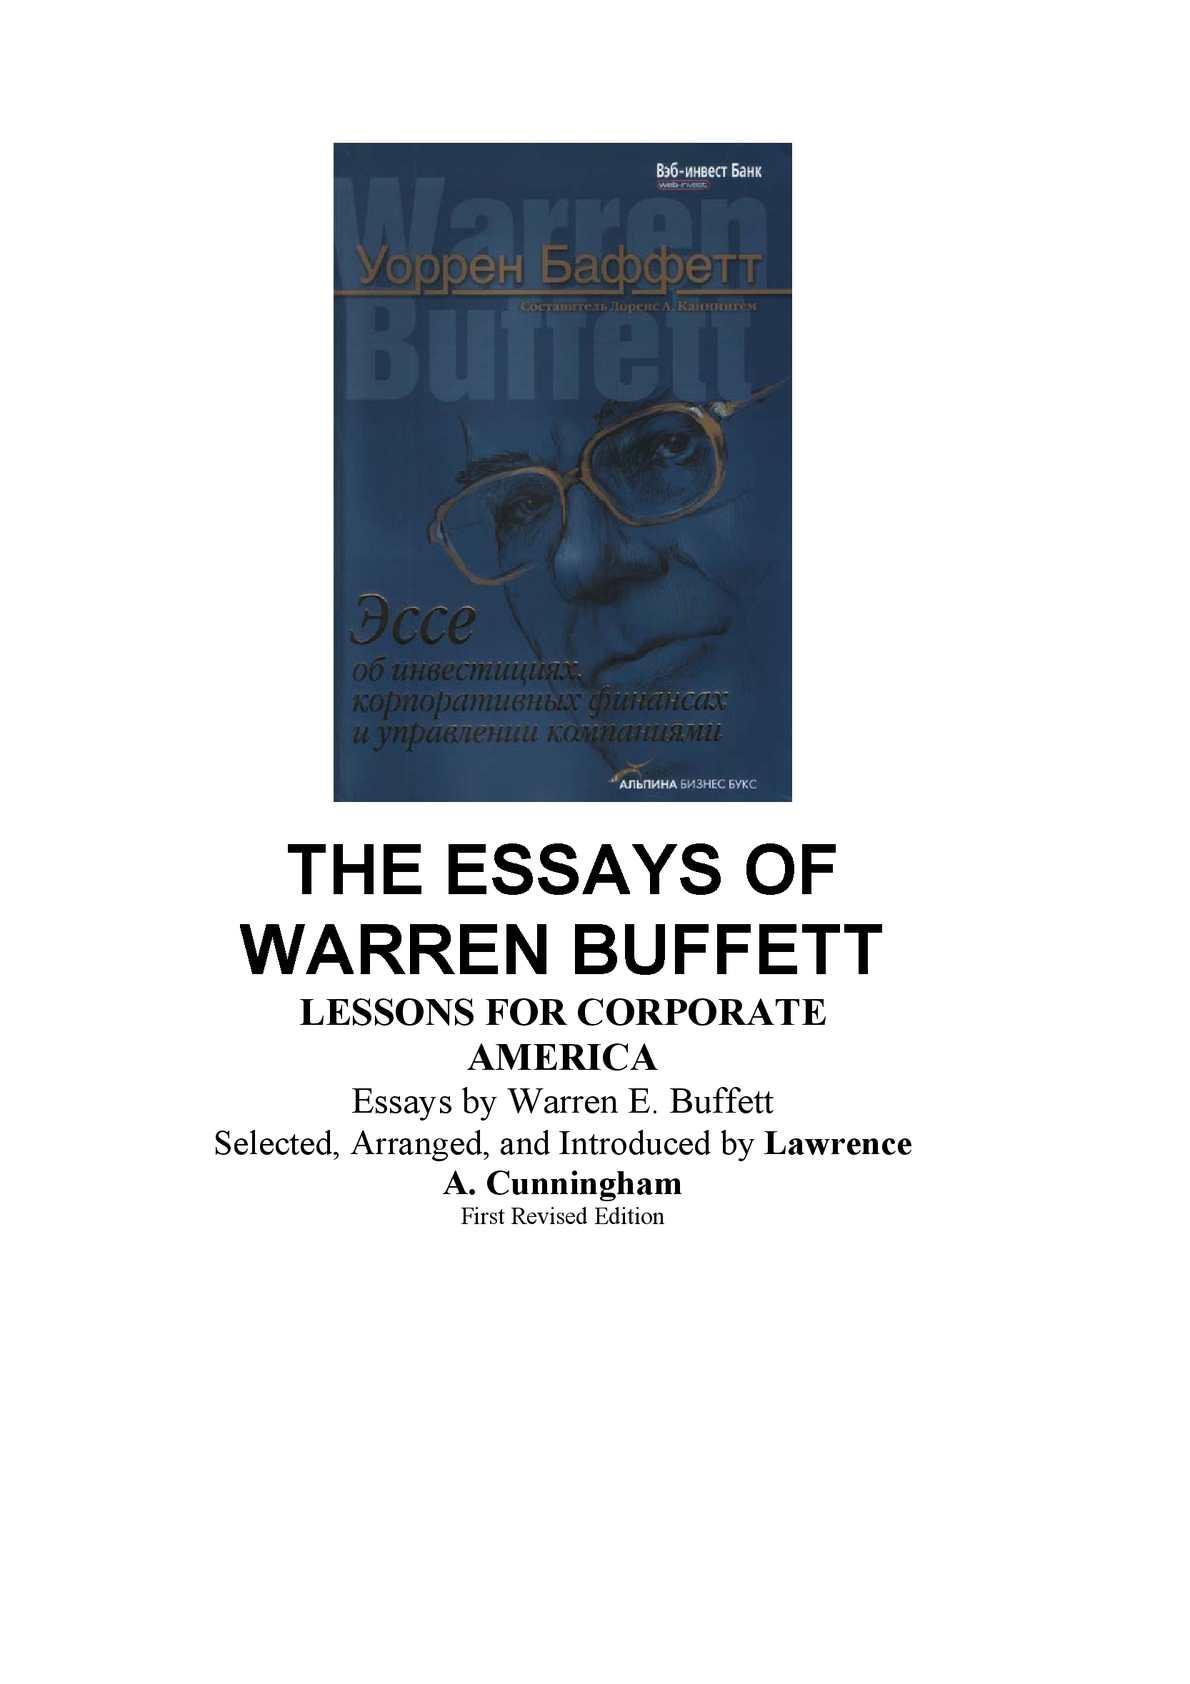 the essays of warren buffett pdf free